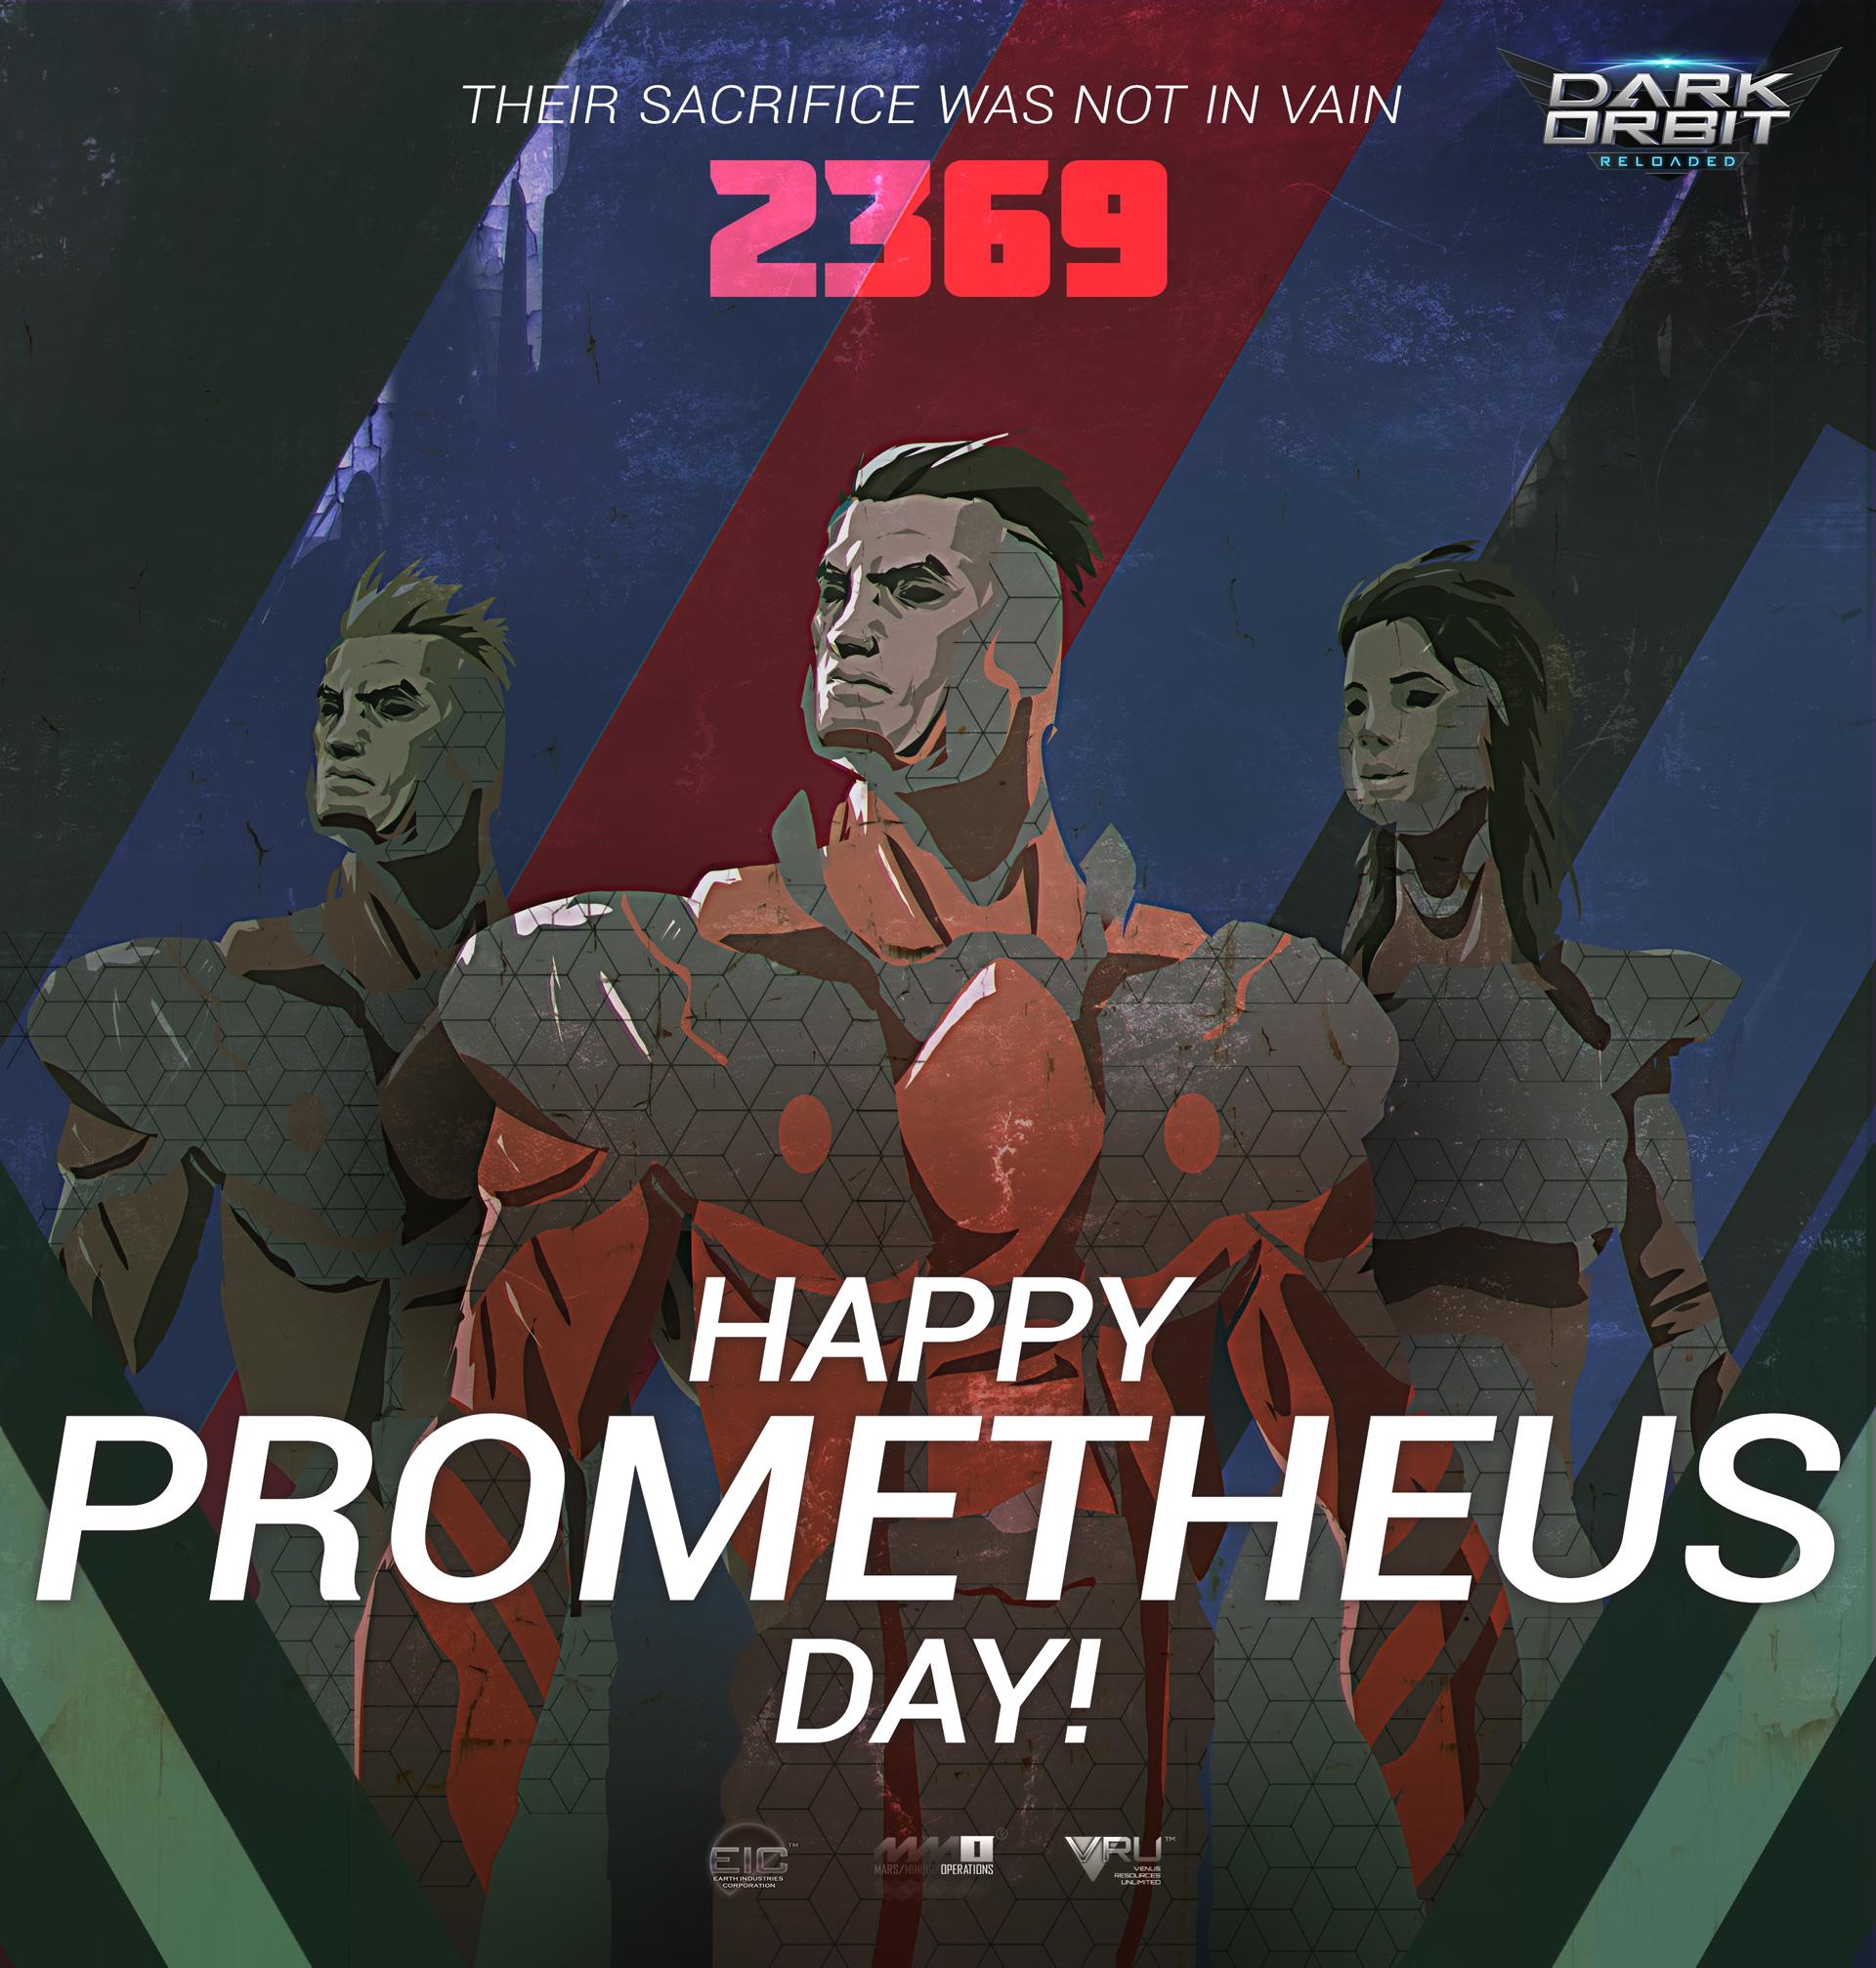 prometheus_propaganda_poster.jpg